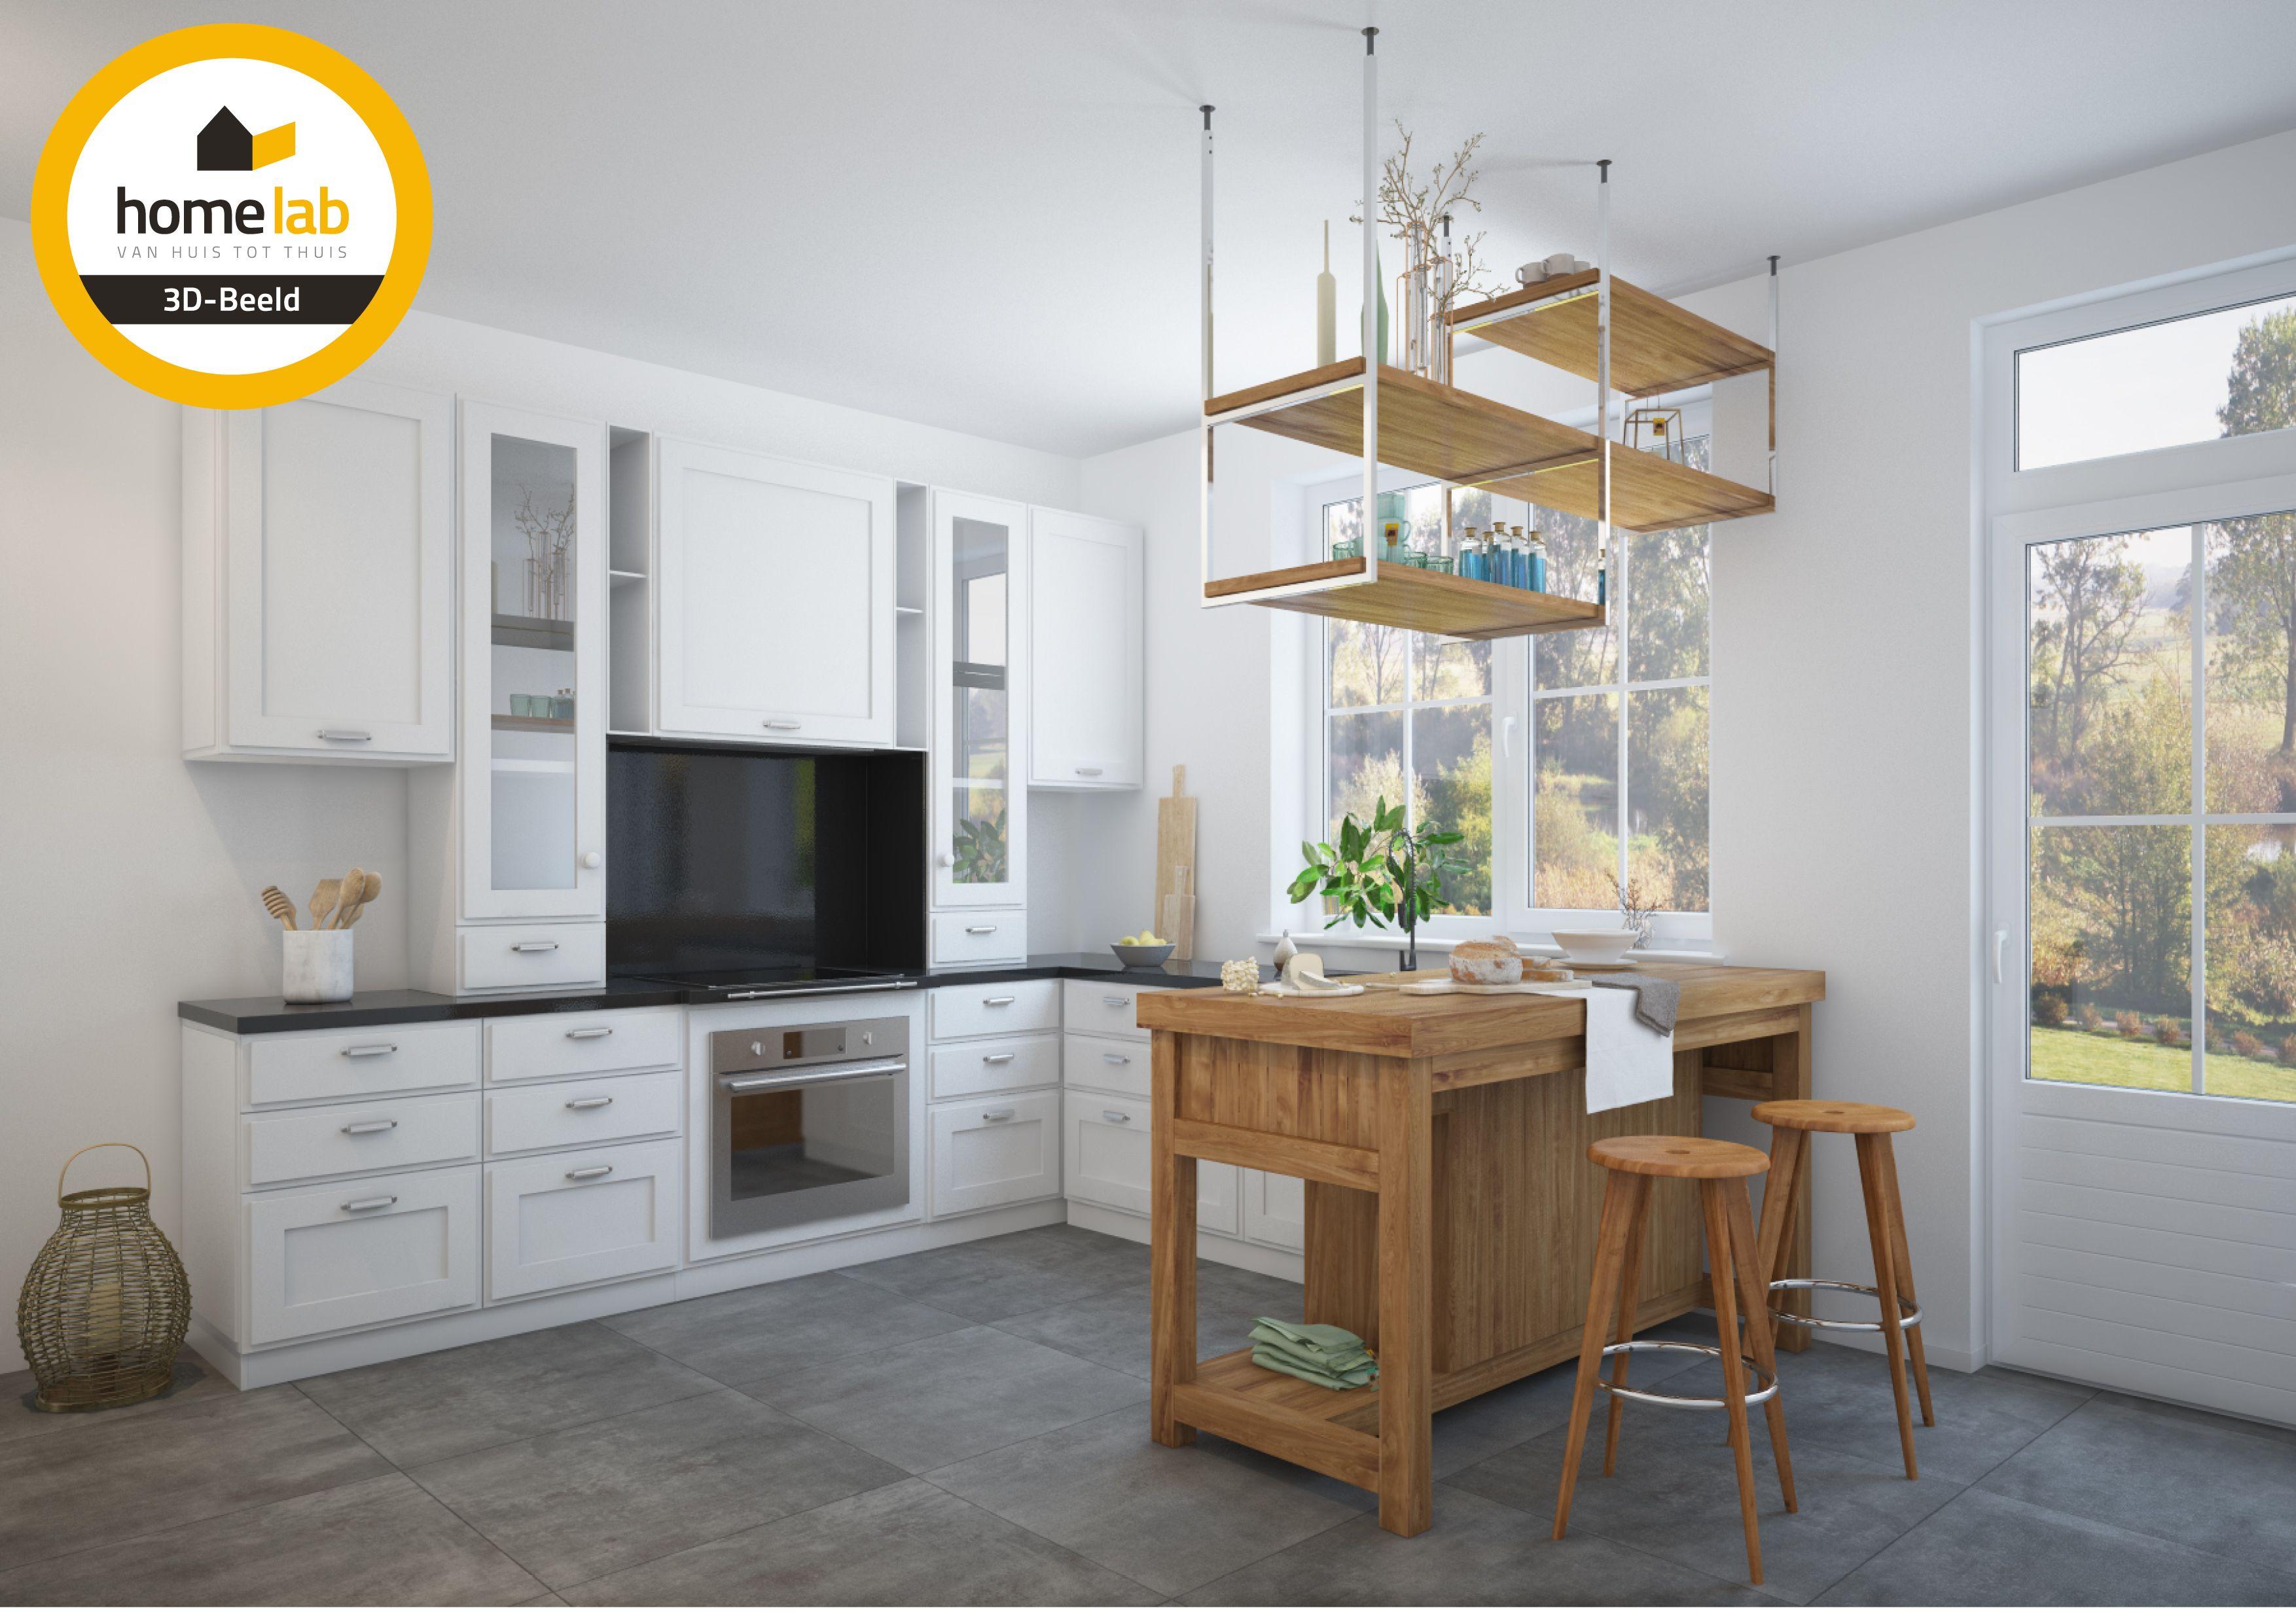 Keuken hout villa tongeren renovatie tafel keukenwand